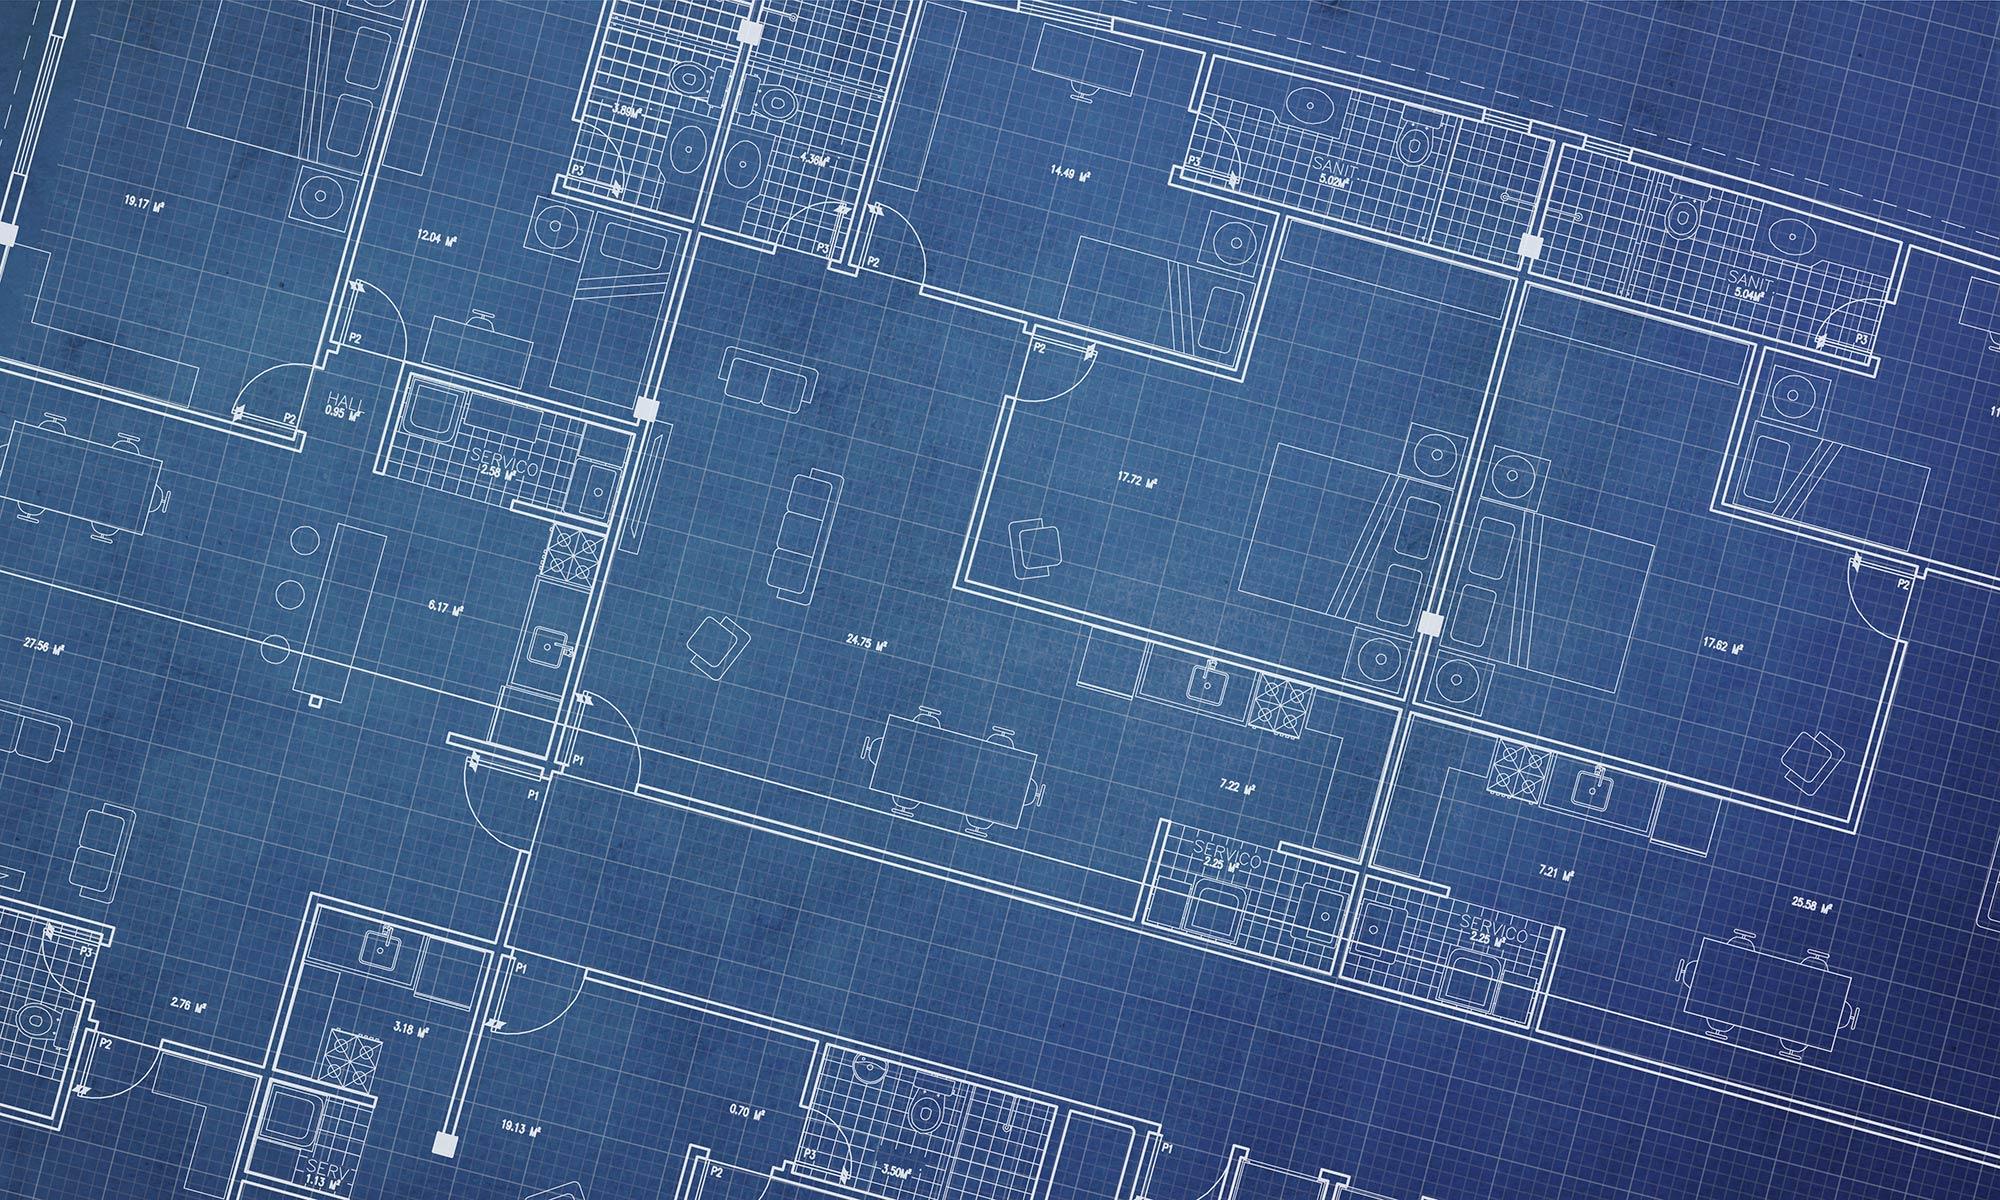 Chief Architect House Plans Blueprint Background Glenco Inc